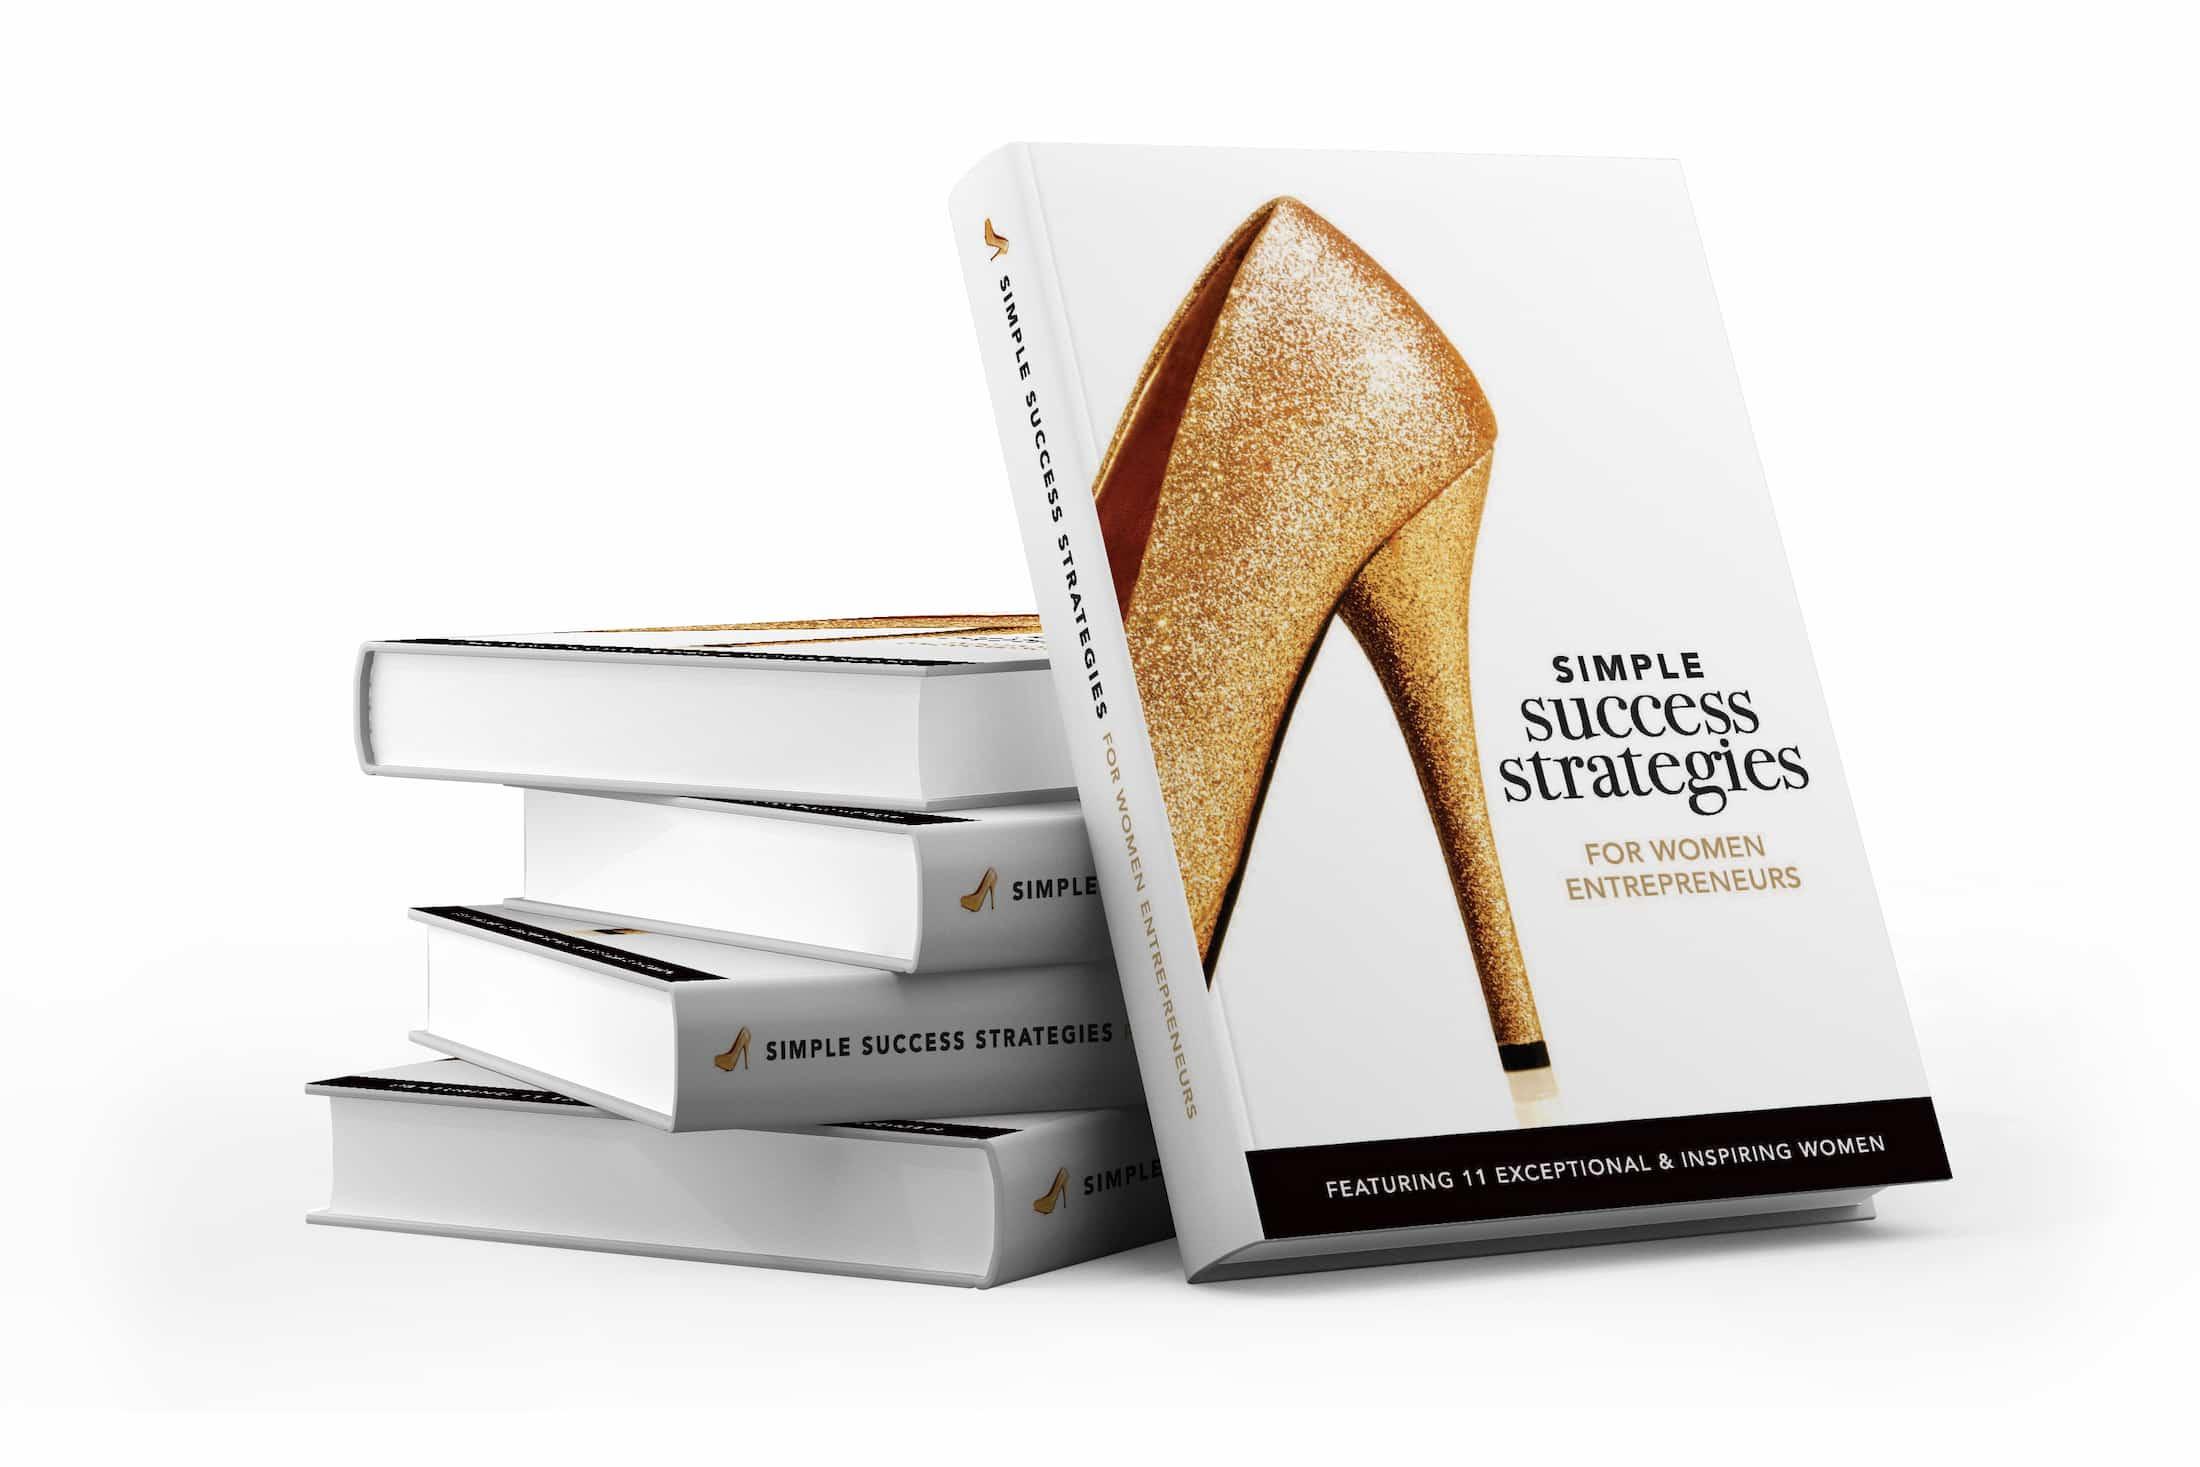 Simple Success Strategies for Women Entrepreneurs book cover